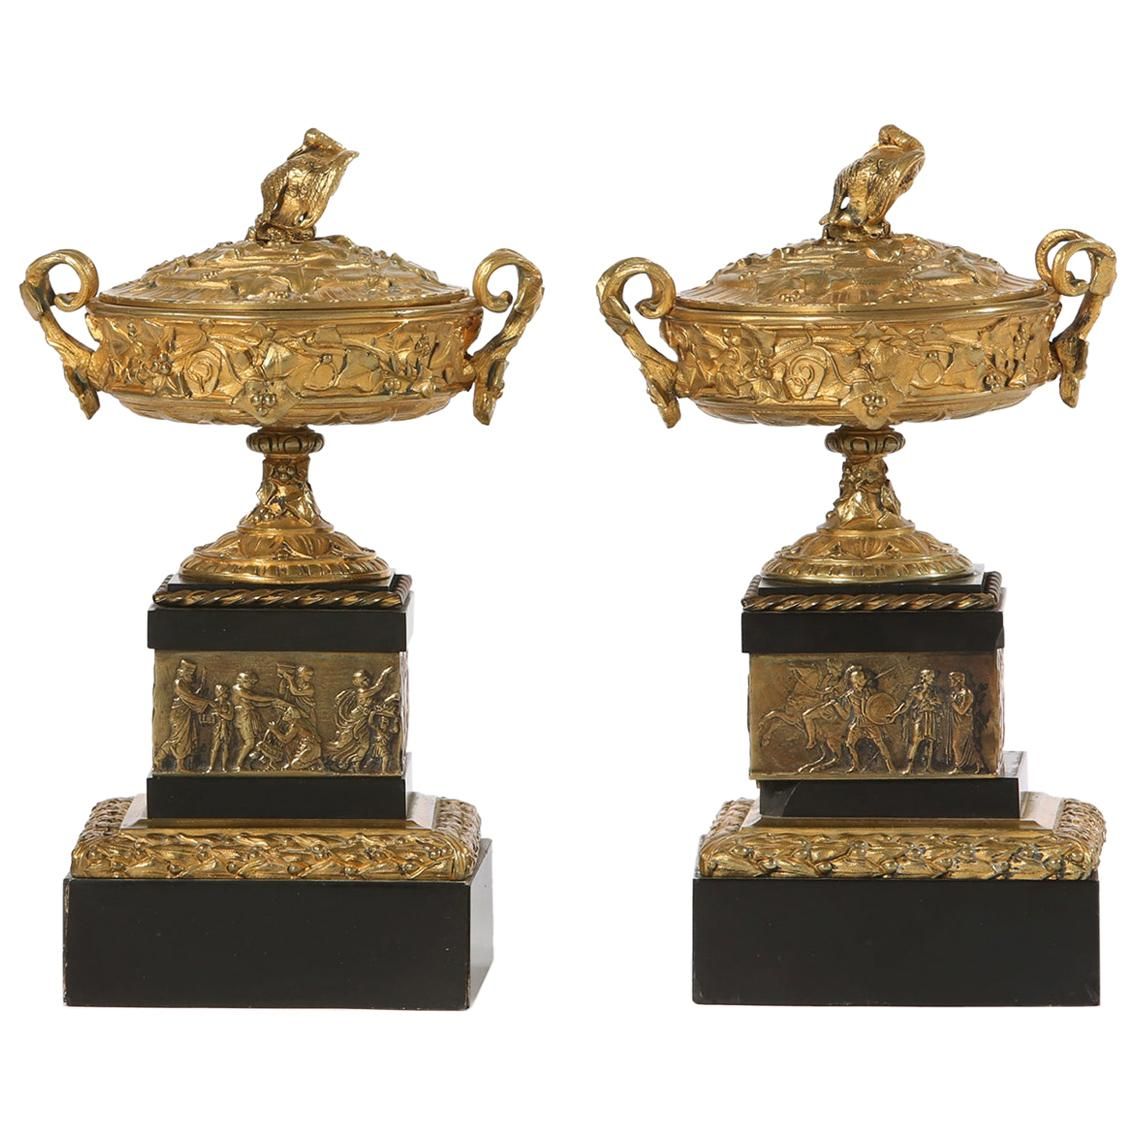 19th Century Gilt Bronze / Marble Pair of Urns